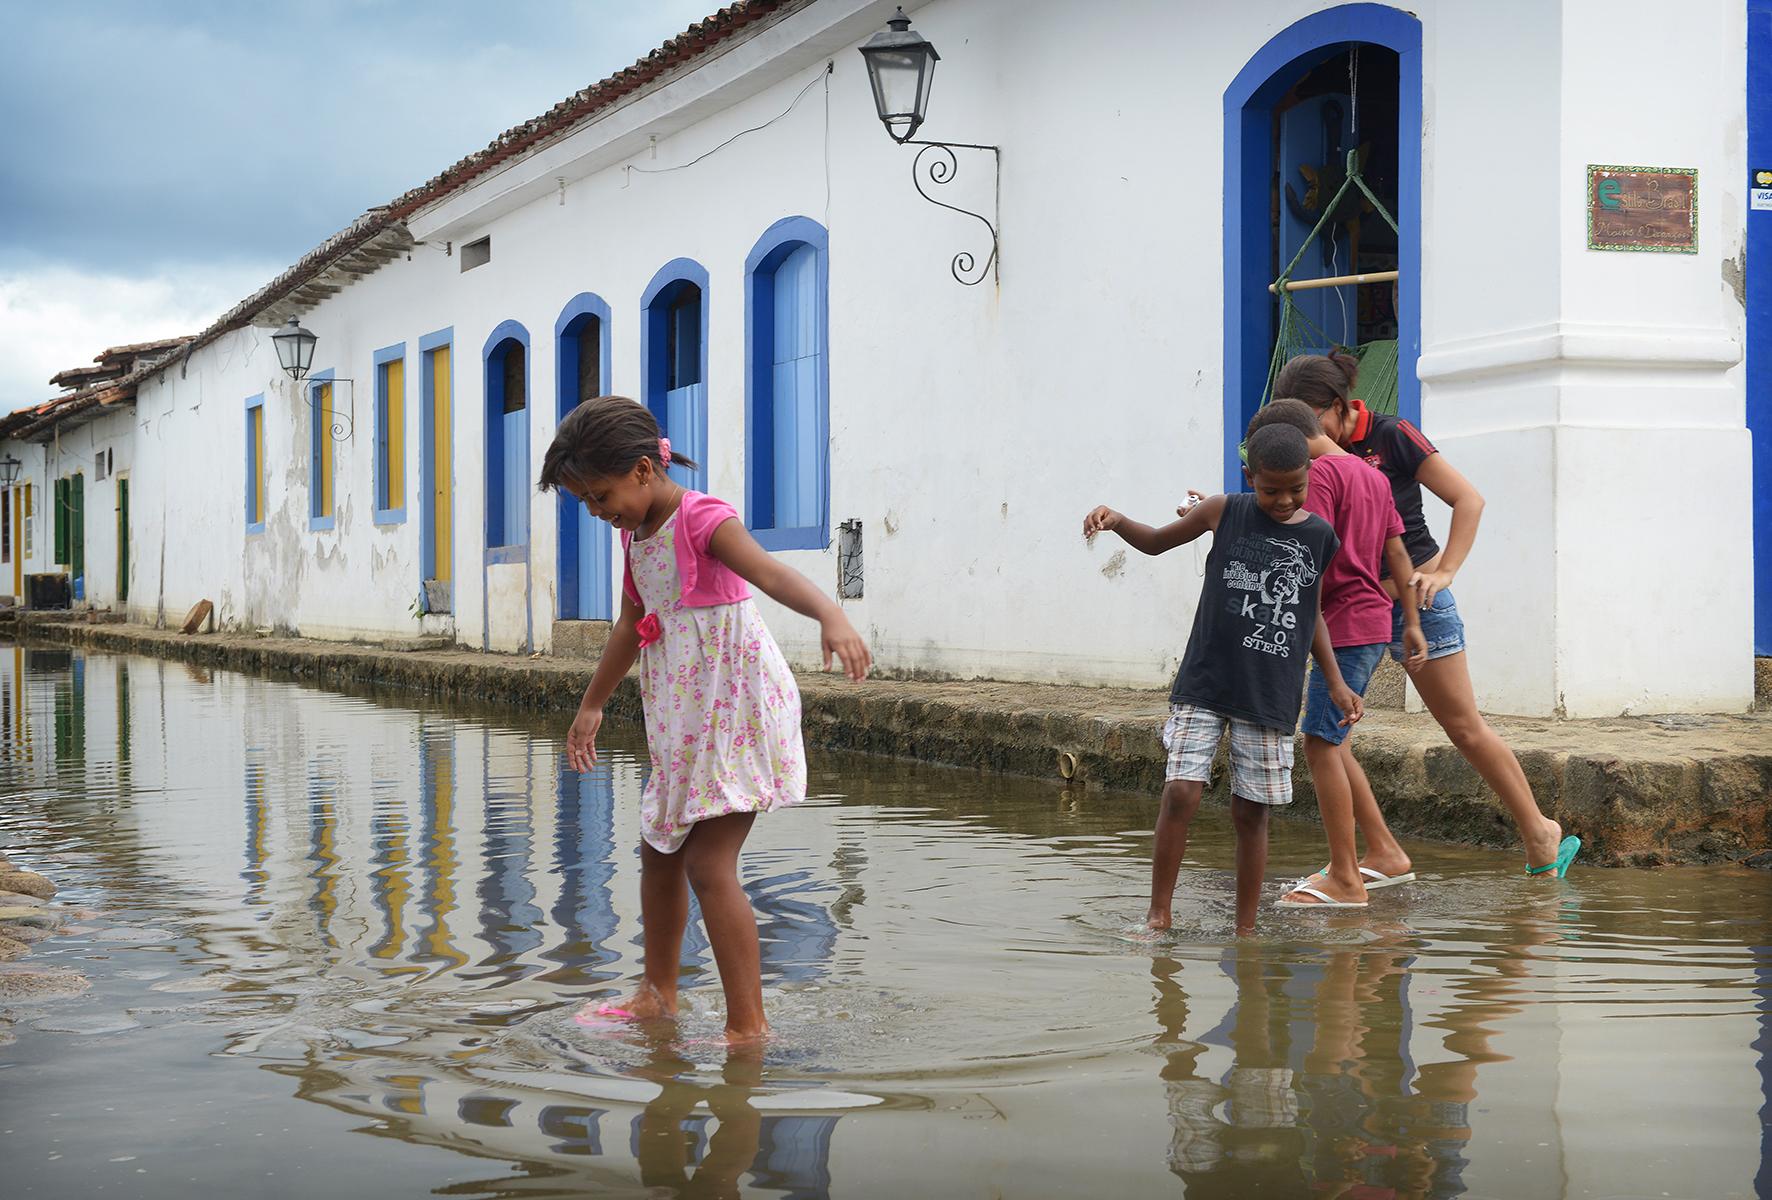 matkablogi, blogi, Brasilia, Paraty, värikäs, vesi